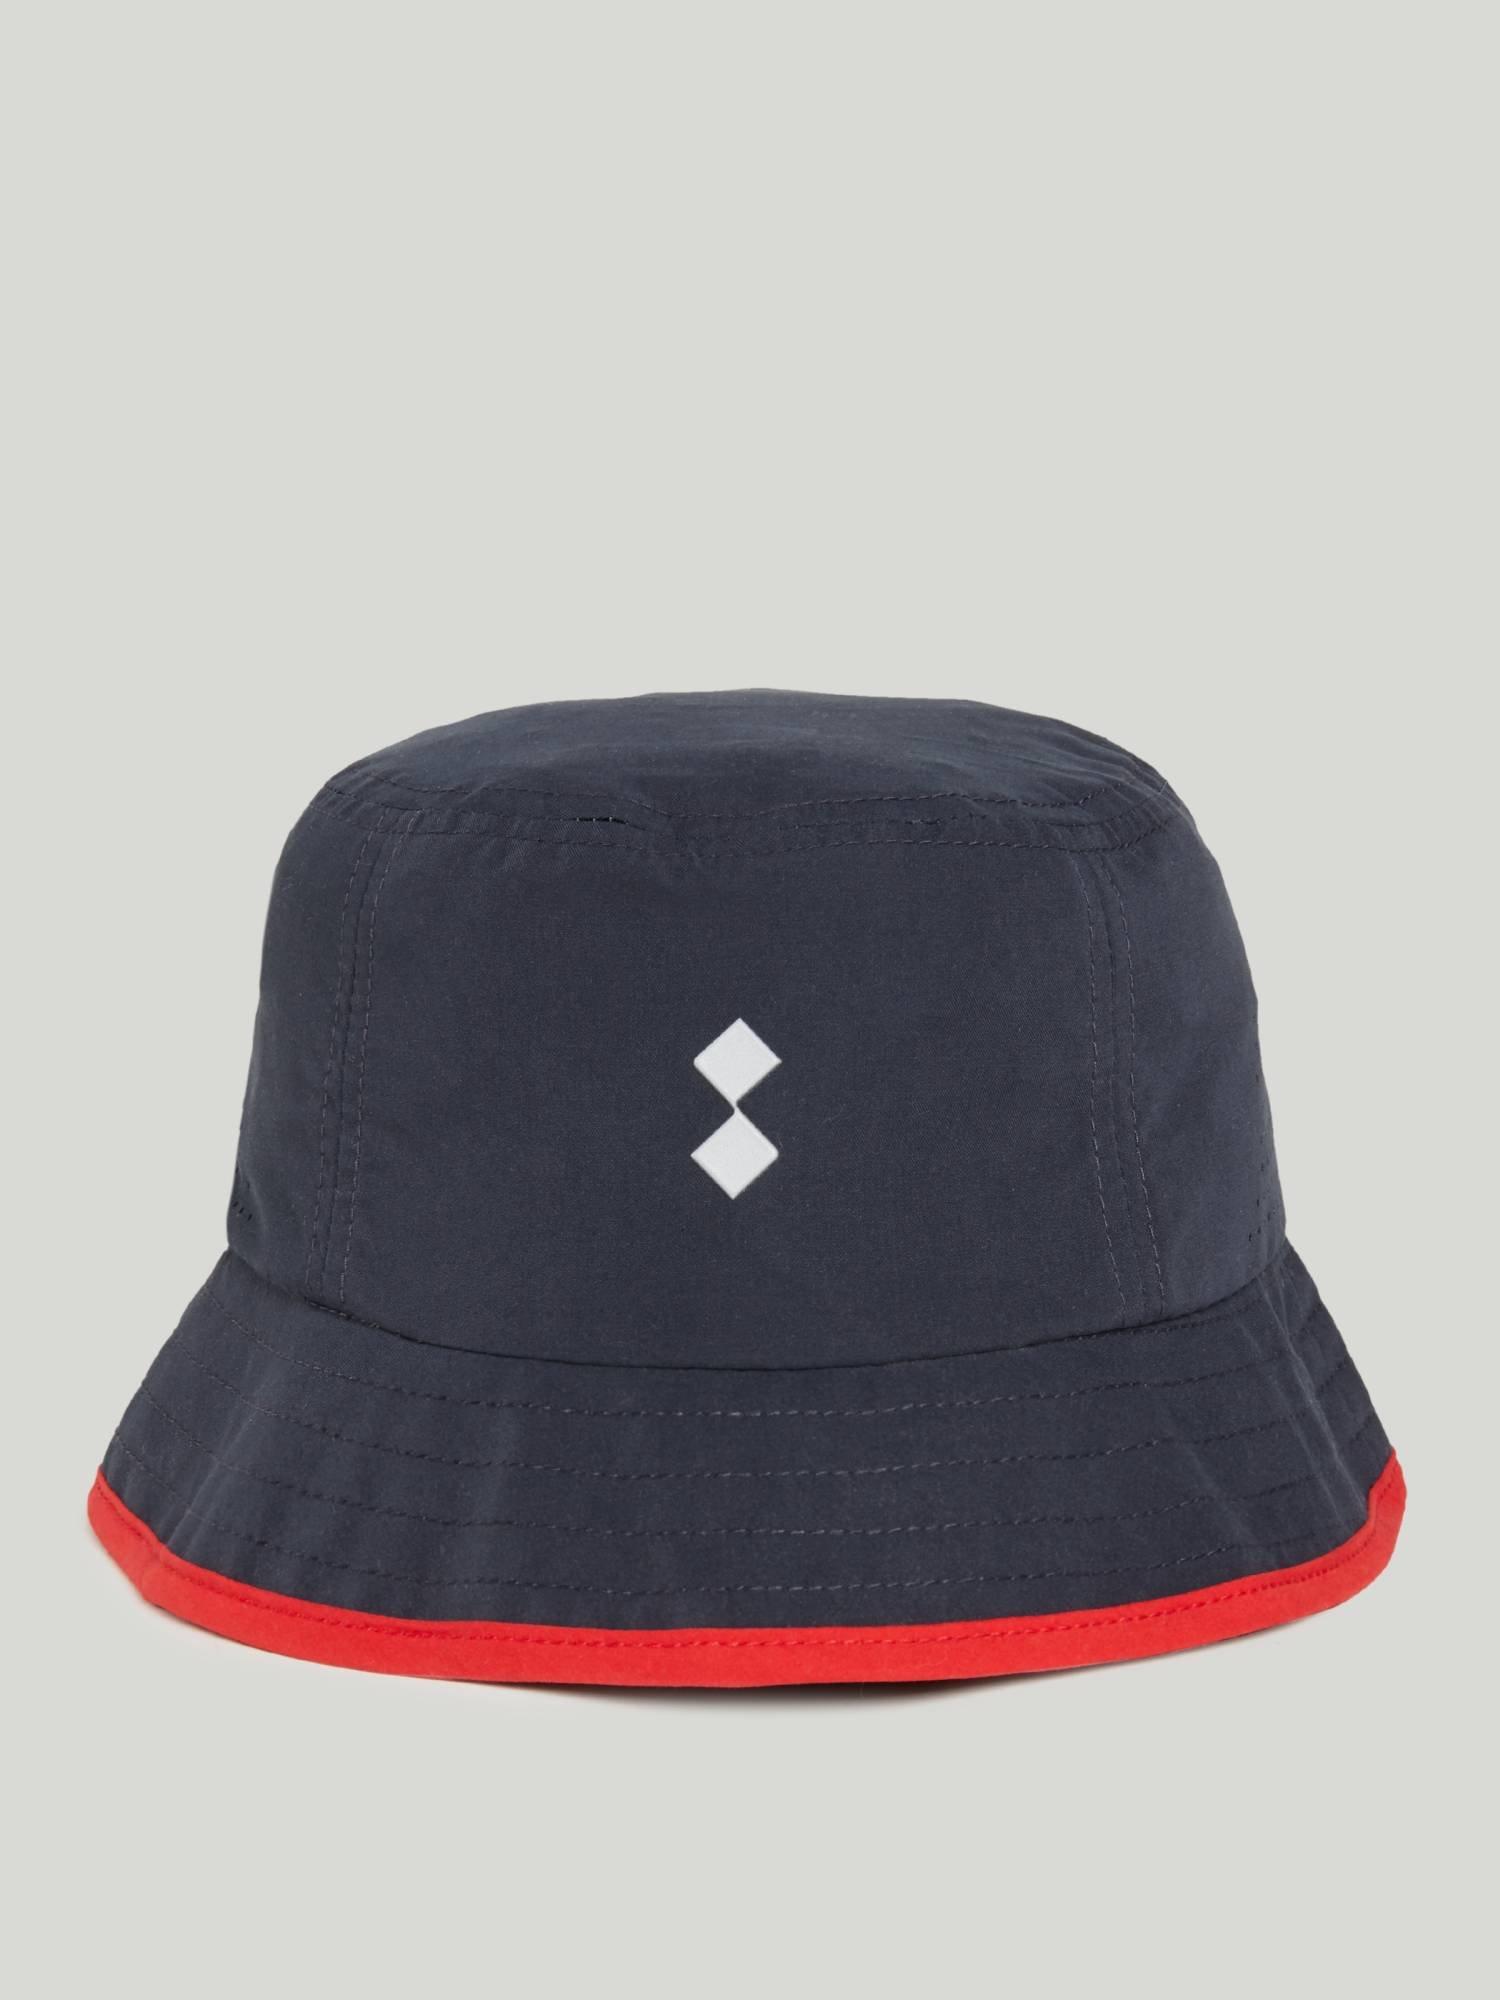 Hat A208 - Marinenblau